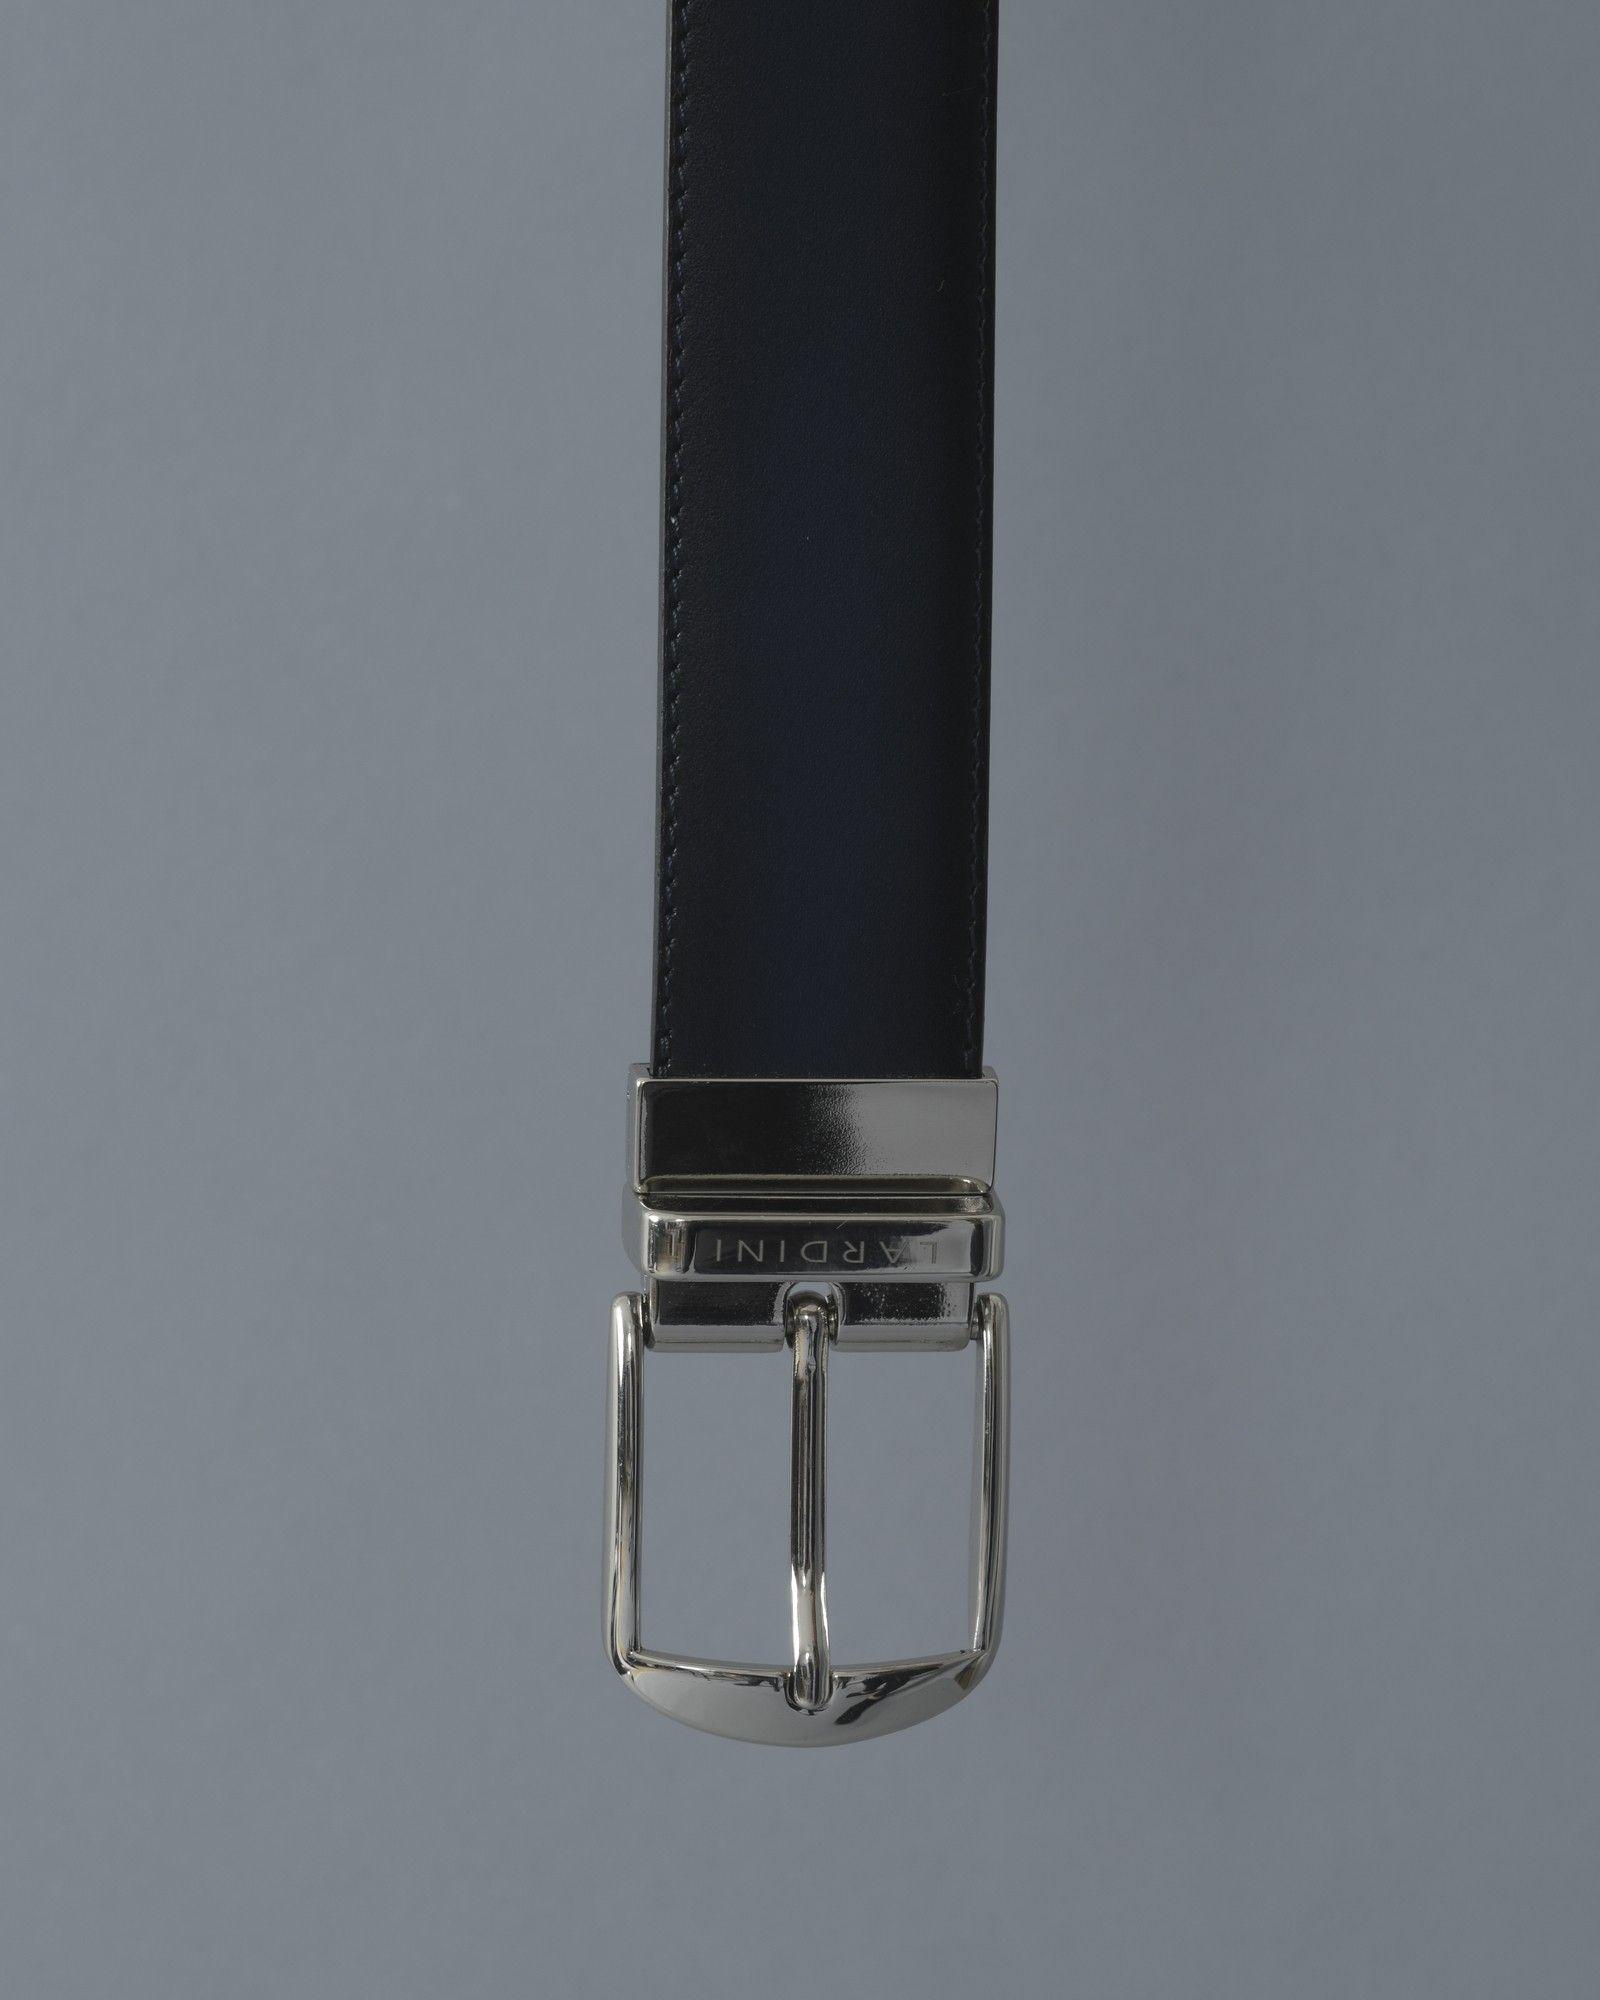 Ceinture bleu/noir Lardini